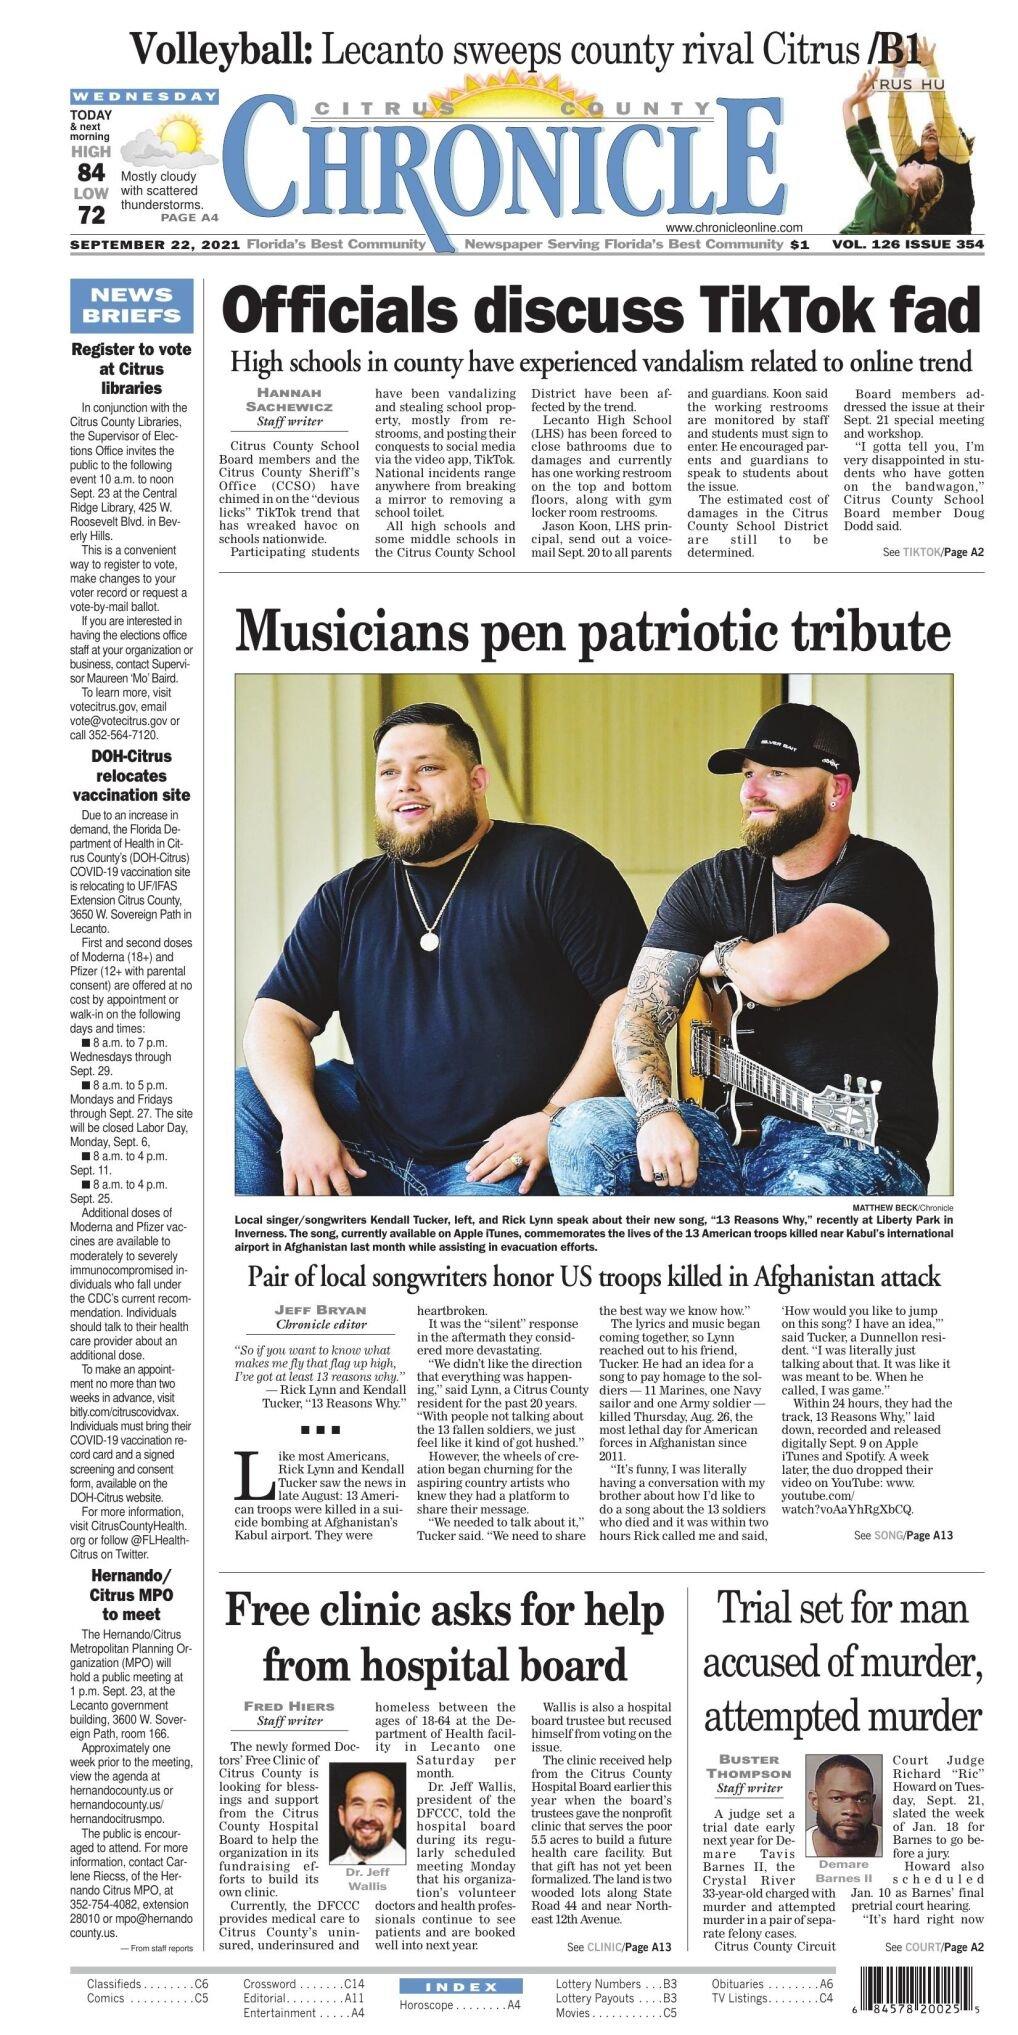 Citrus County Chronicle Sep 22, 2021 e-edition